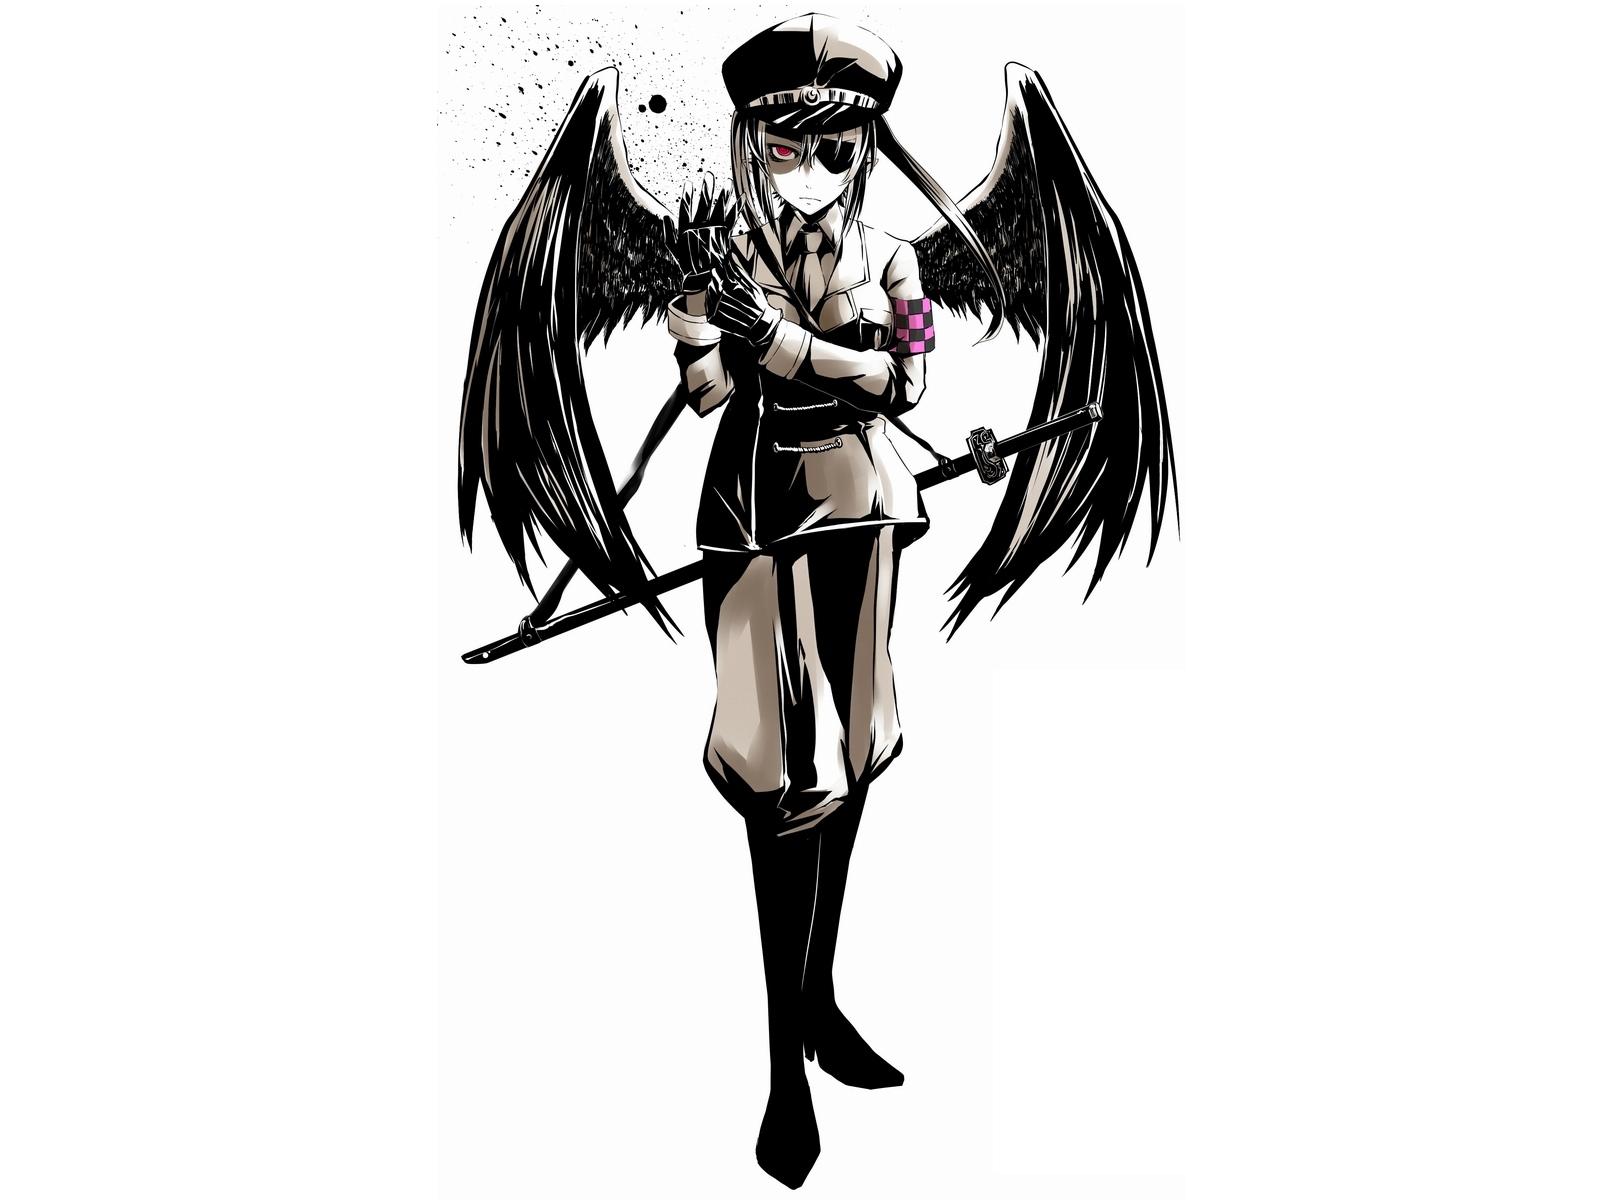 1600x1200 Download Wallpaper Girl, Eyes, Wings, Gloves, Cap Hd